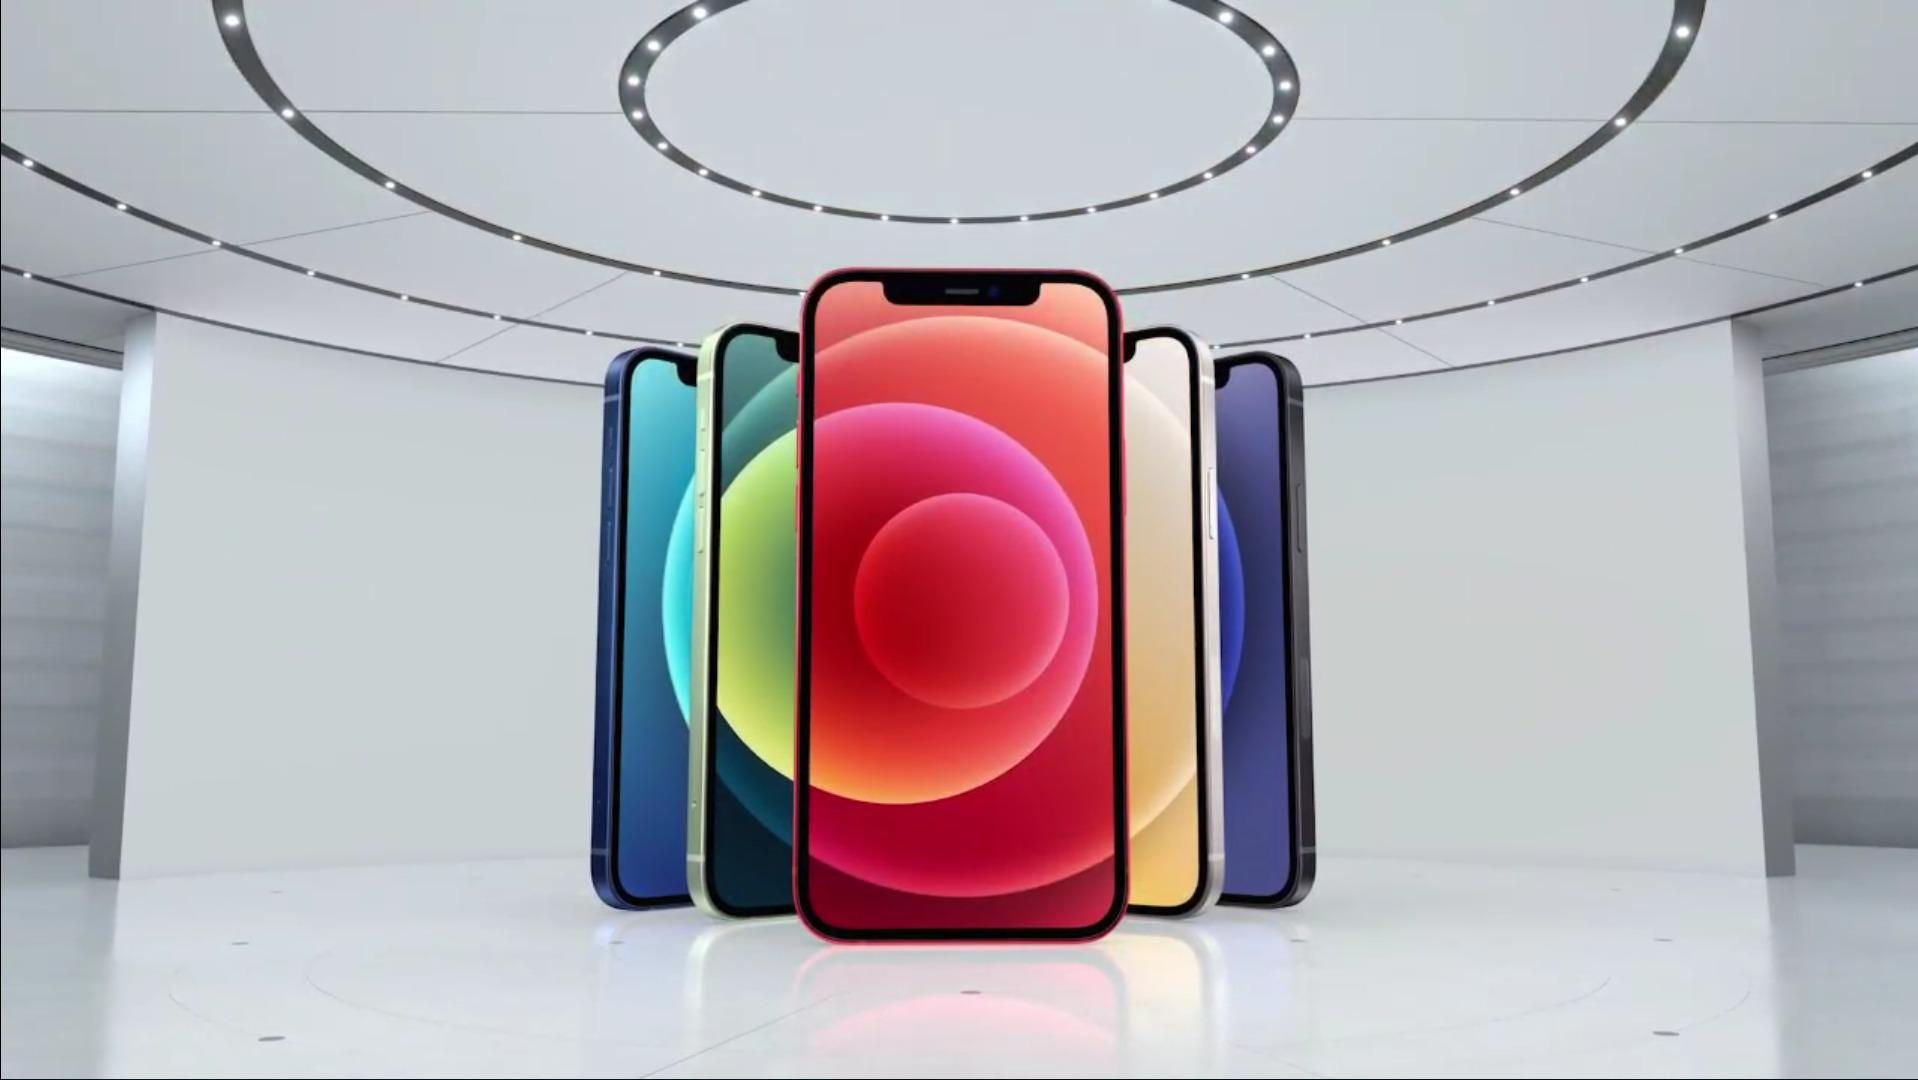 「iPhone12Miniが欲しい」のアイキャッチ画像